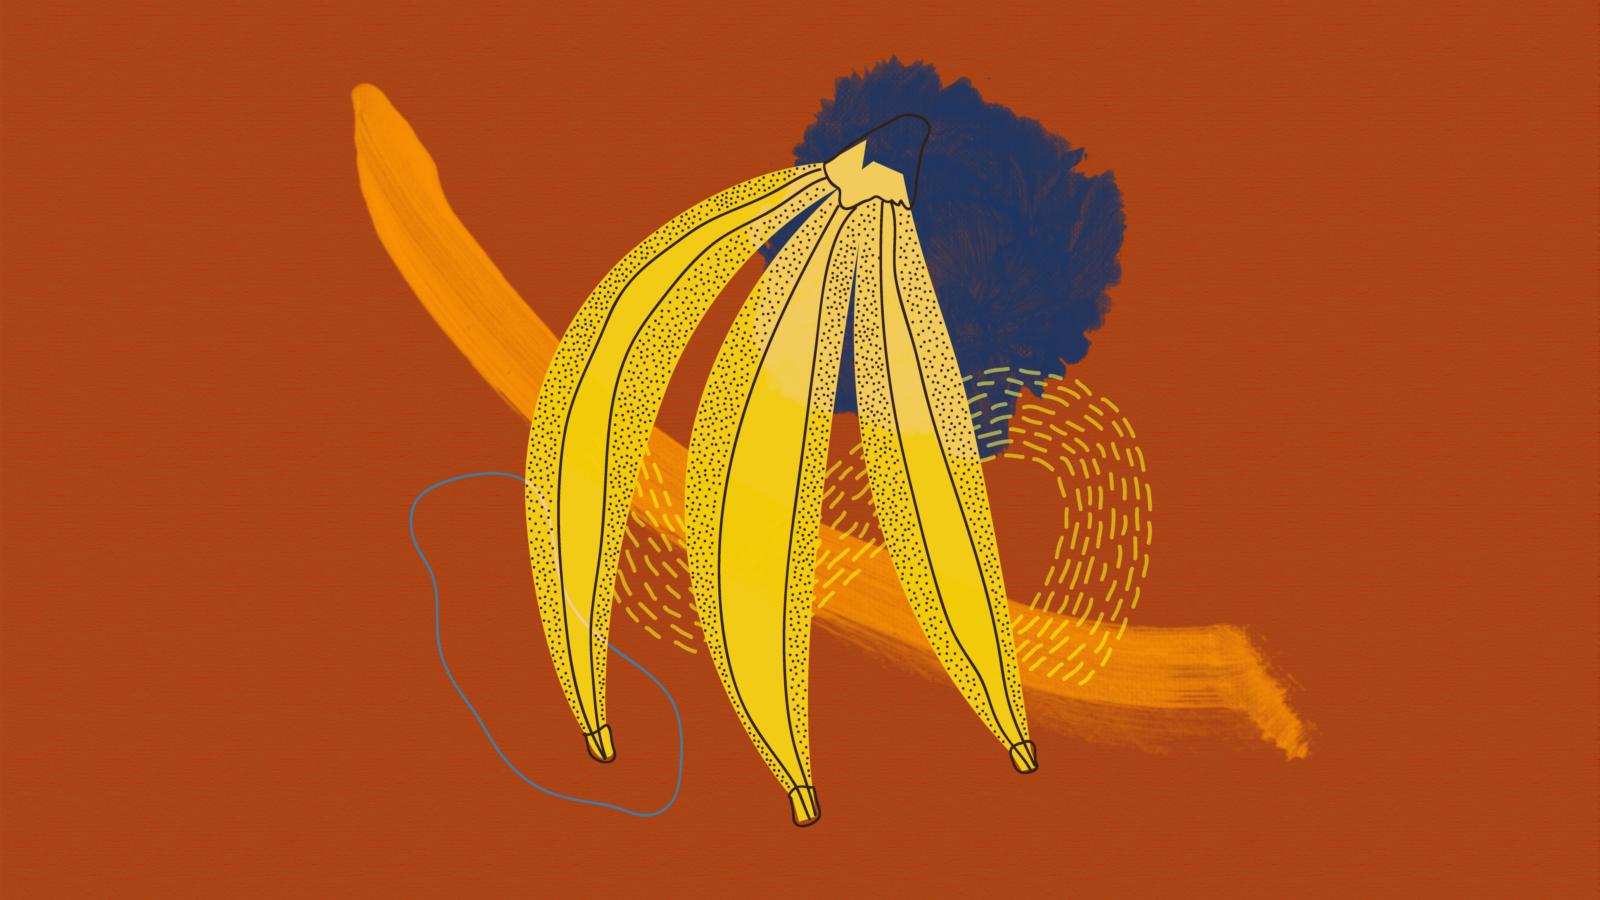 "<p>ILUSTRAÇÃO DE <a href=""https://www.ibirapitanga.org.br/artistas/mariana-rodrigues/"">MARIANA RODRIGUES</a></p>"